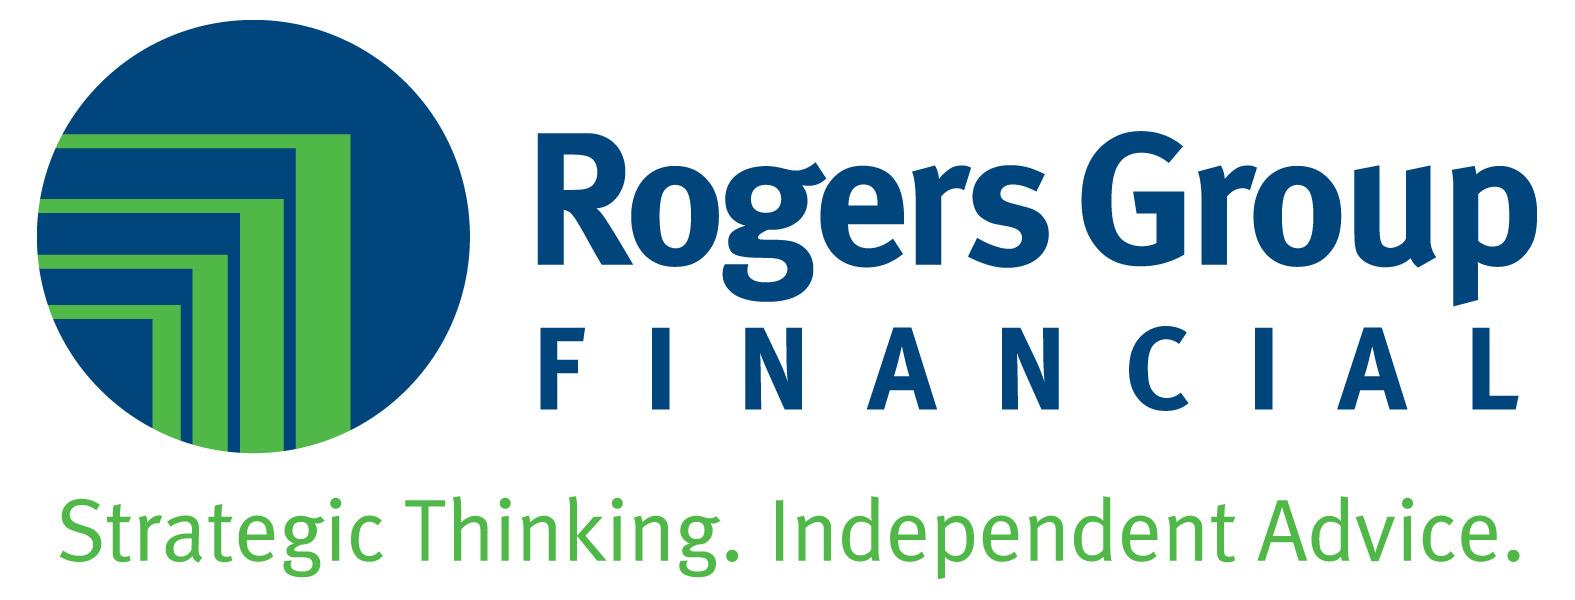 Rogers Group Logo Hi Res